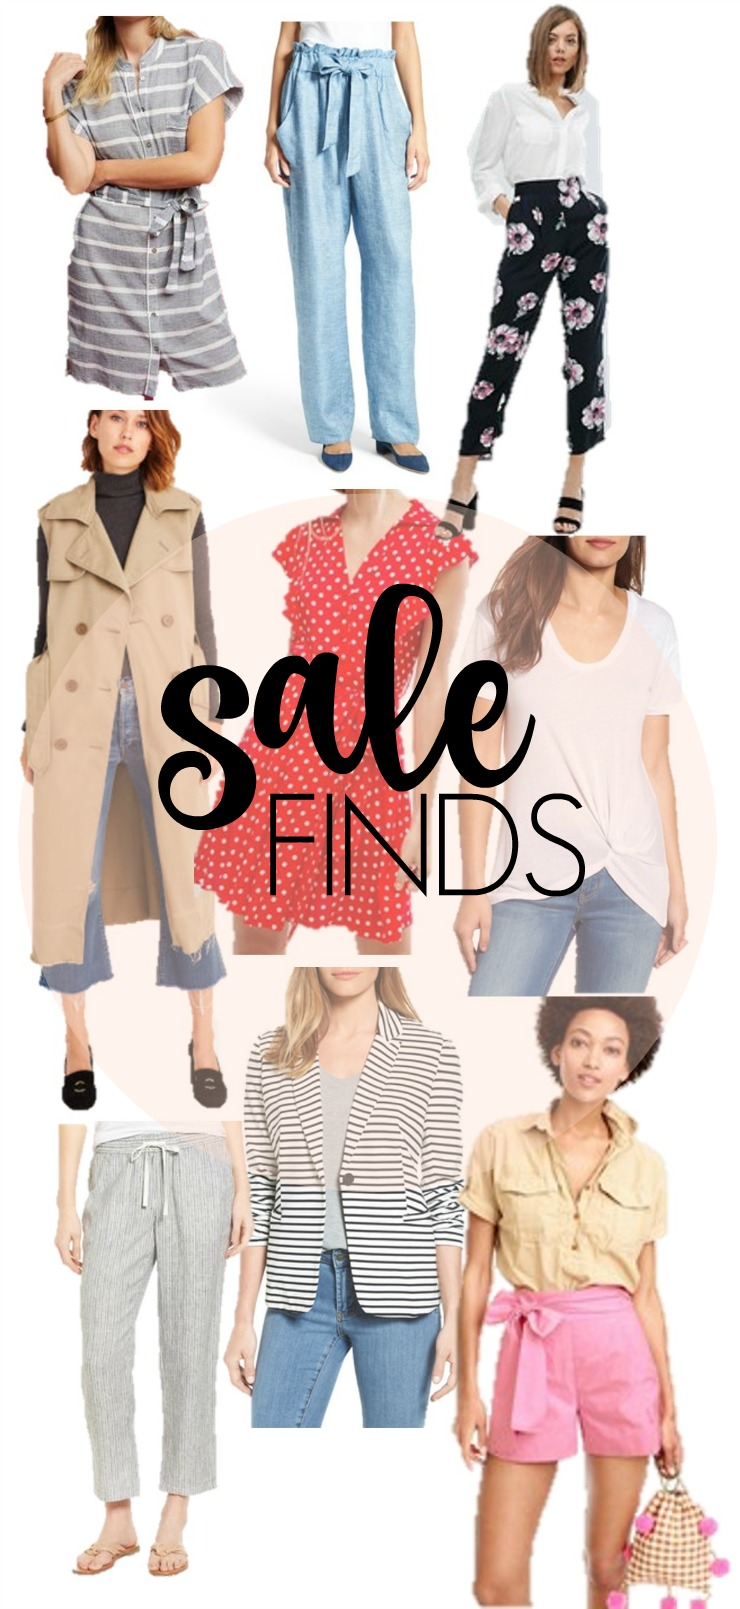 sale finds